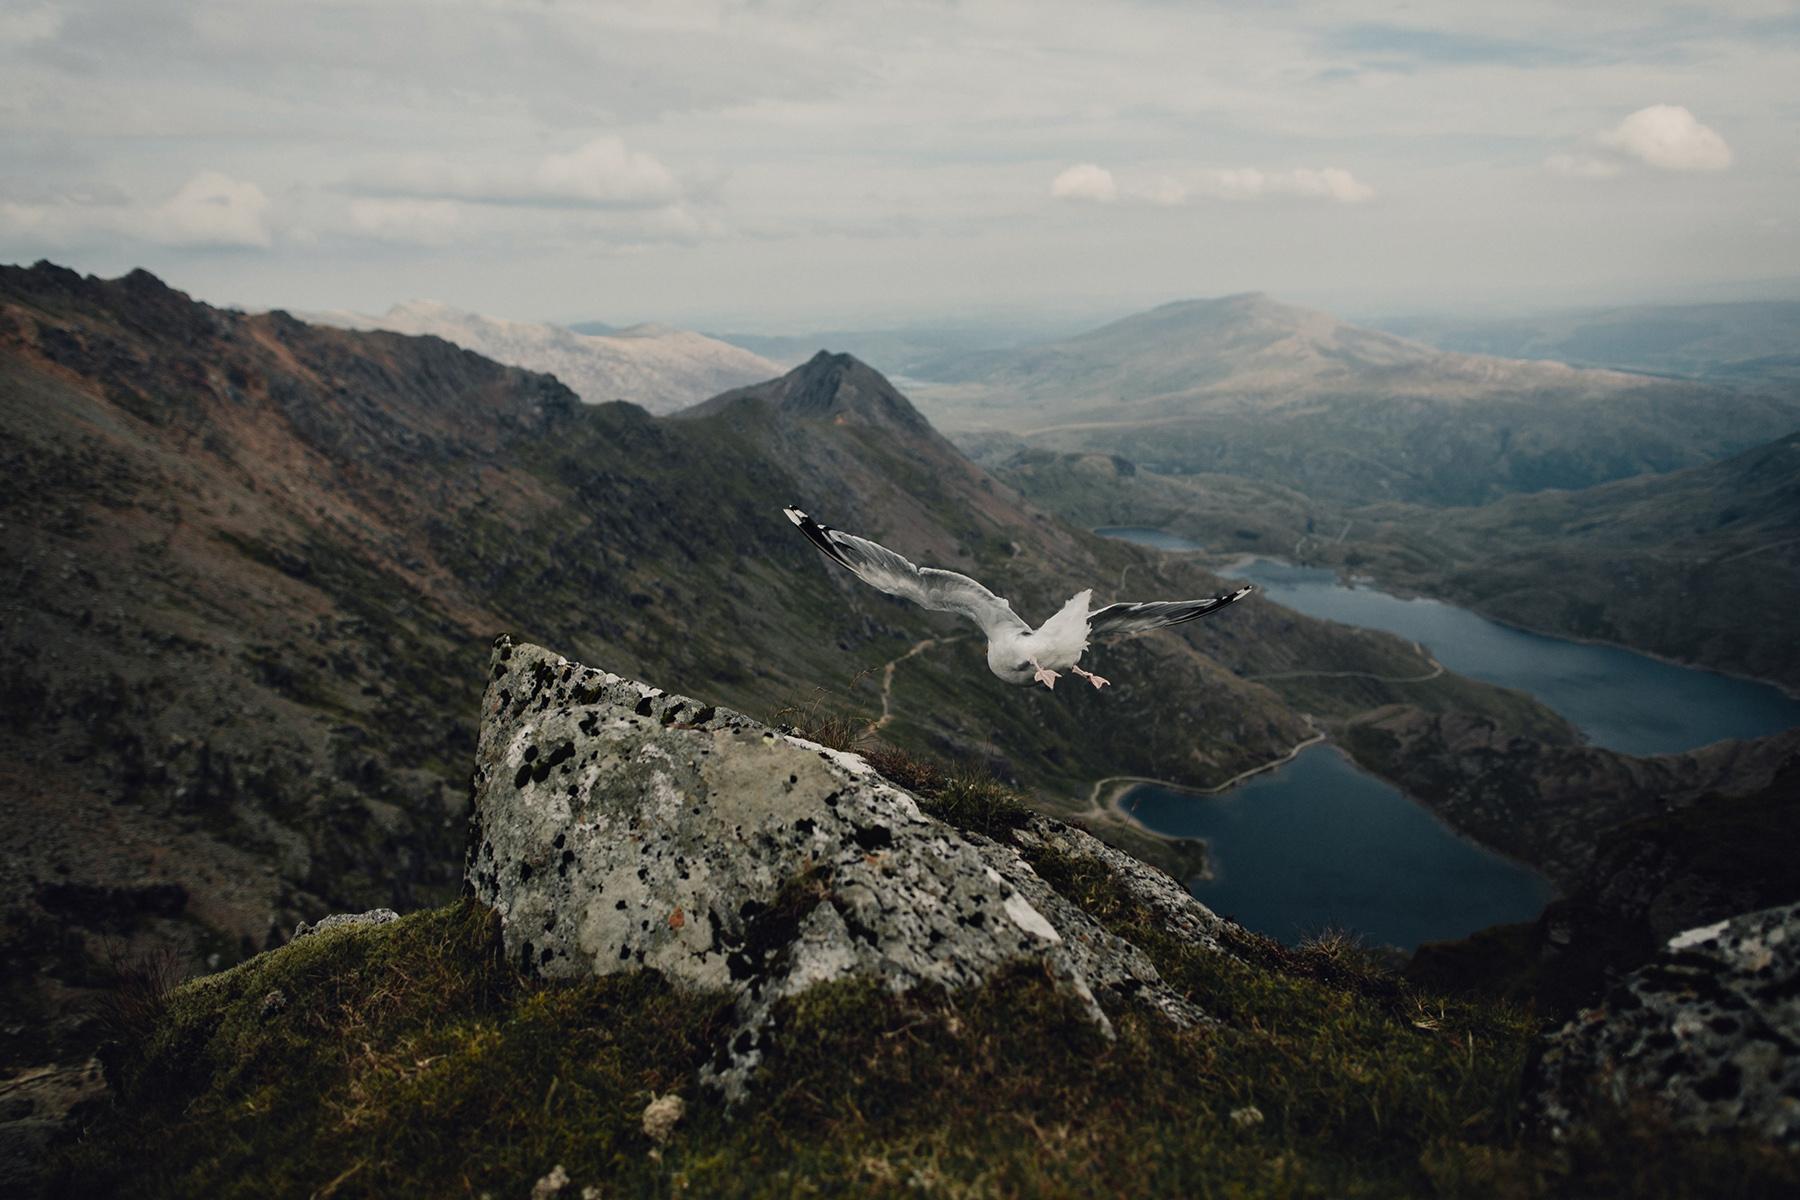 Mt-Snowdon-Hike-Photos-From-Peny-Pass-00151.jpg